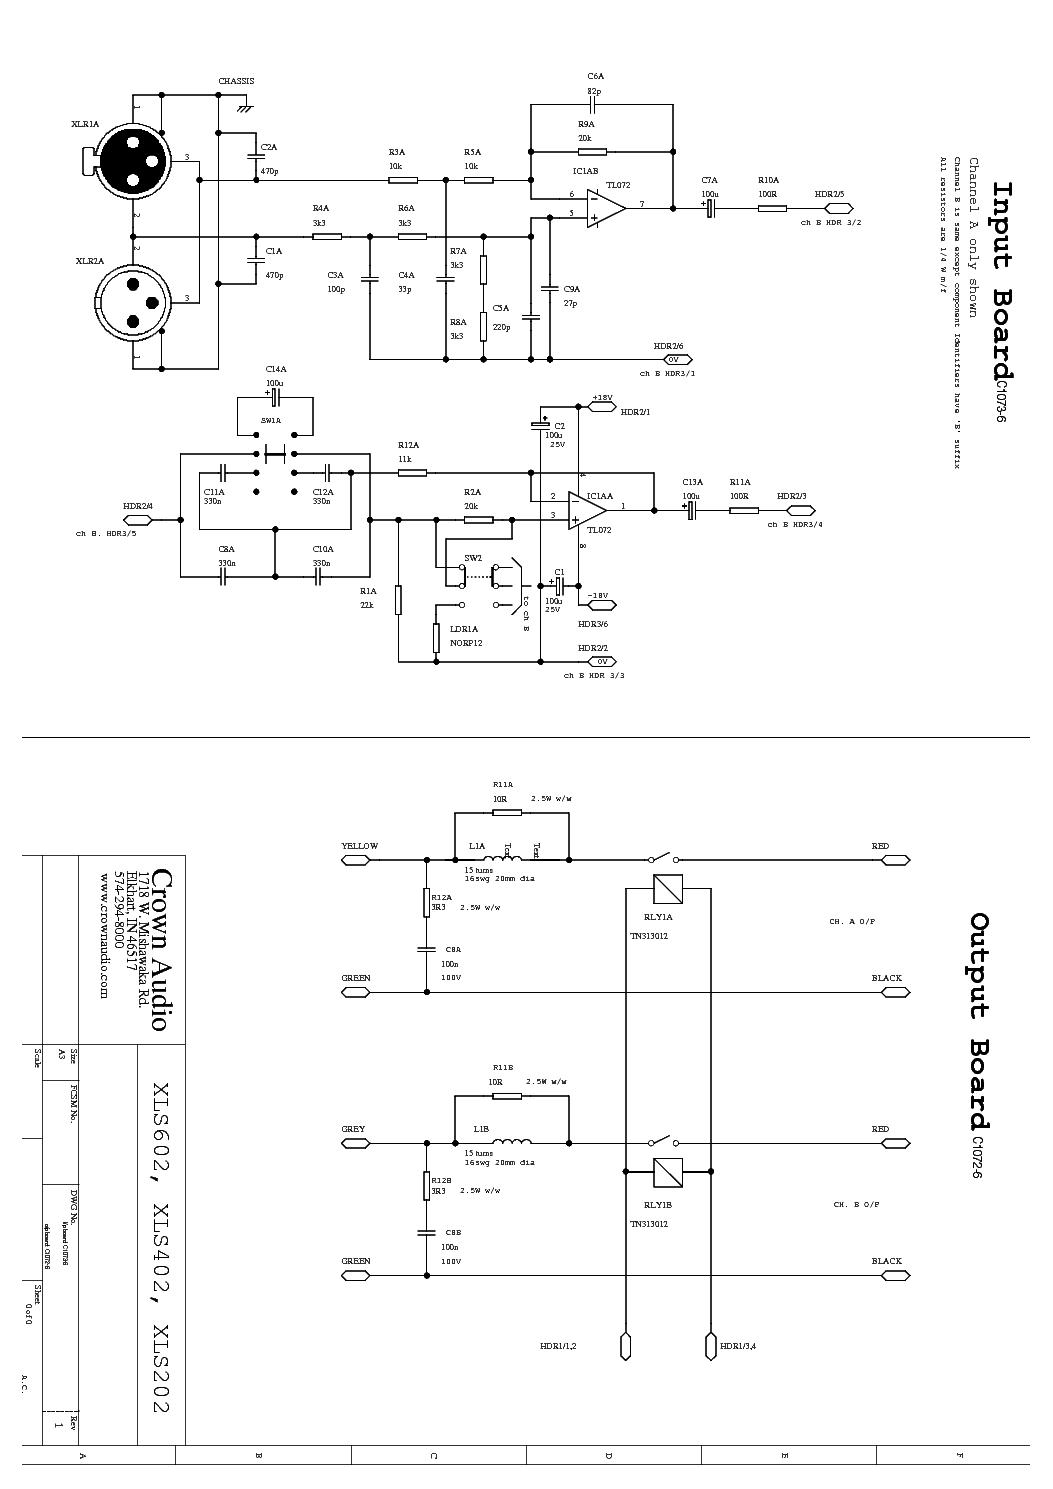 hight resolution of crown xls202 xls402 xls602 sch 1 service manual 2nd page